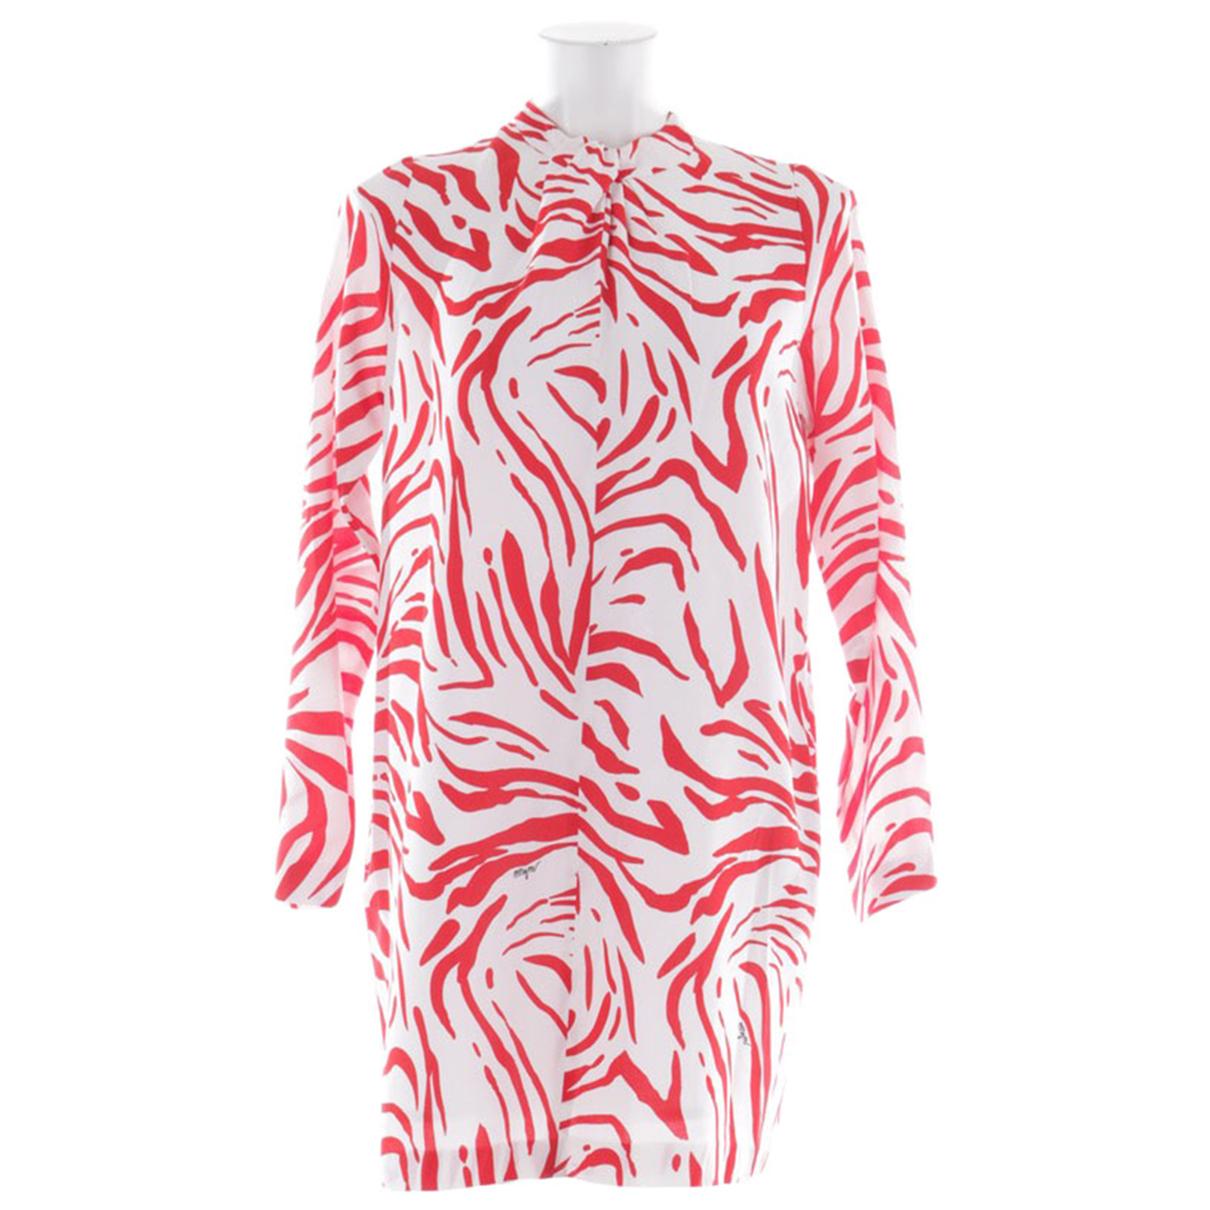 Msgm \N Red dress for Women 36 FR